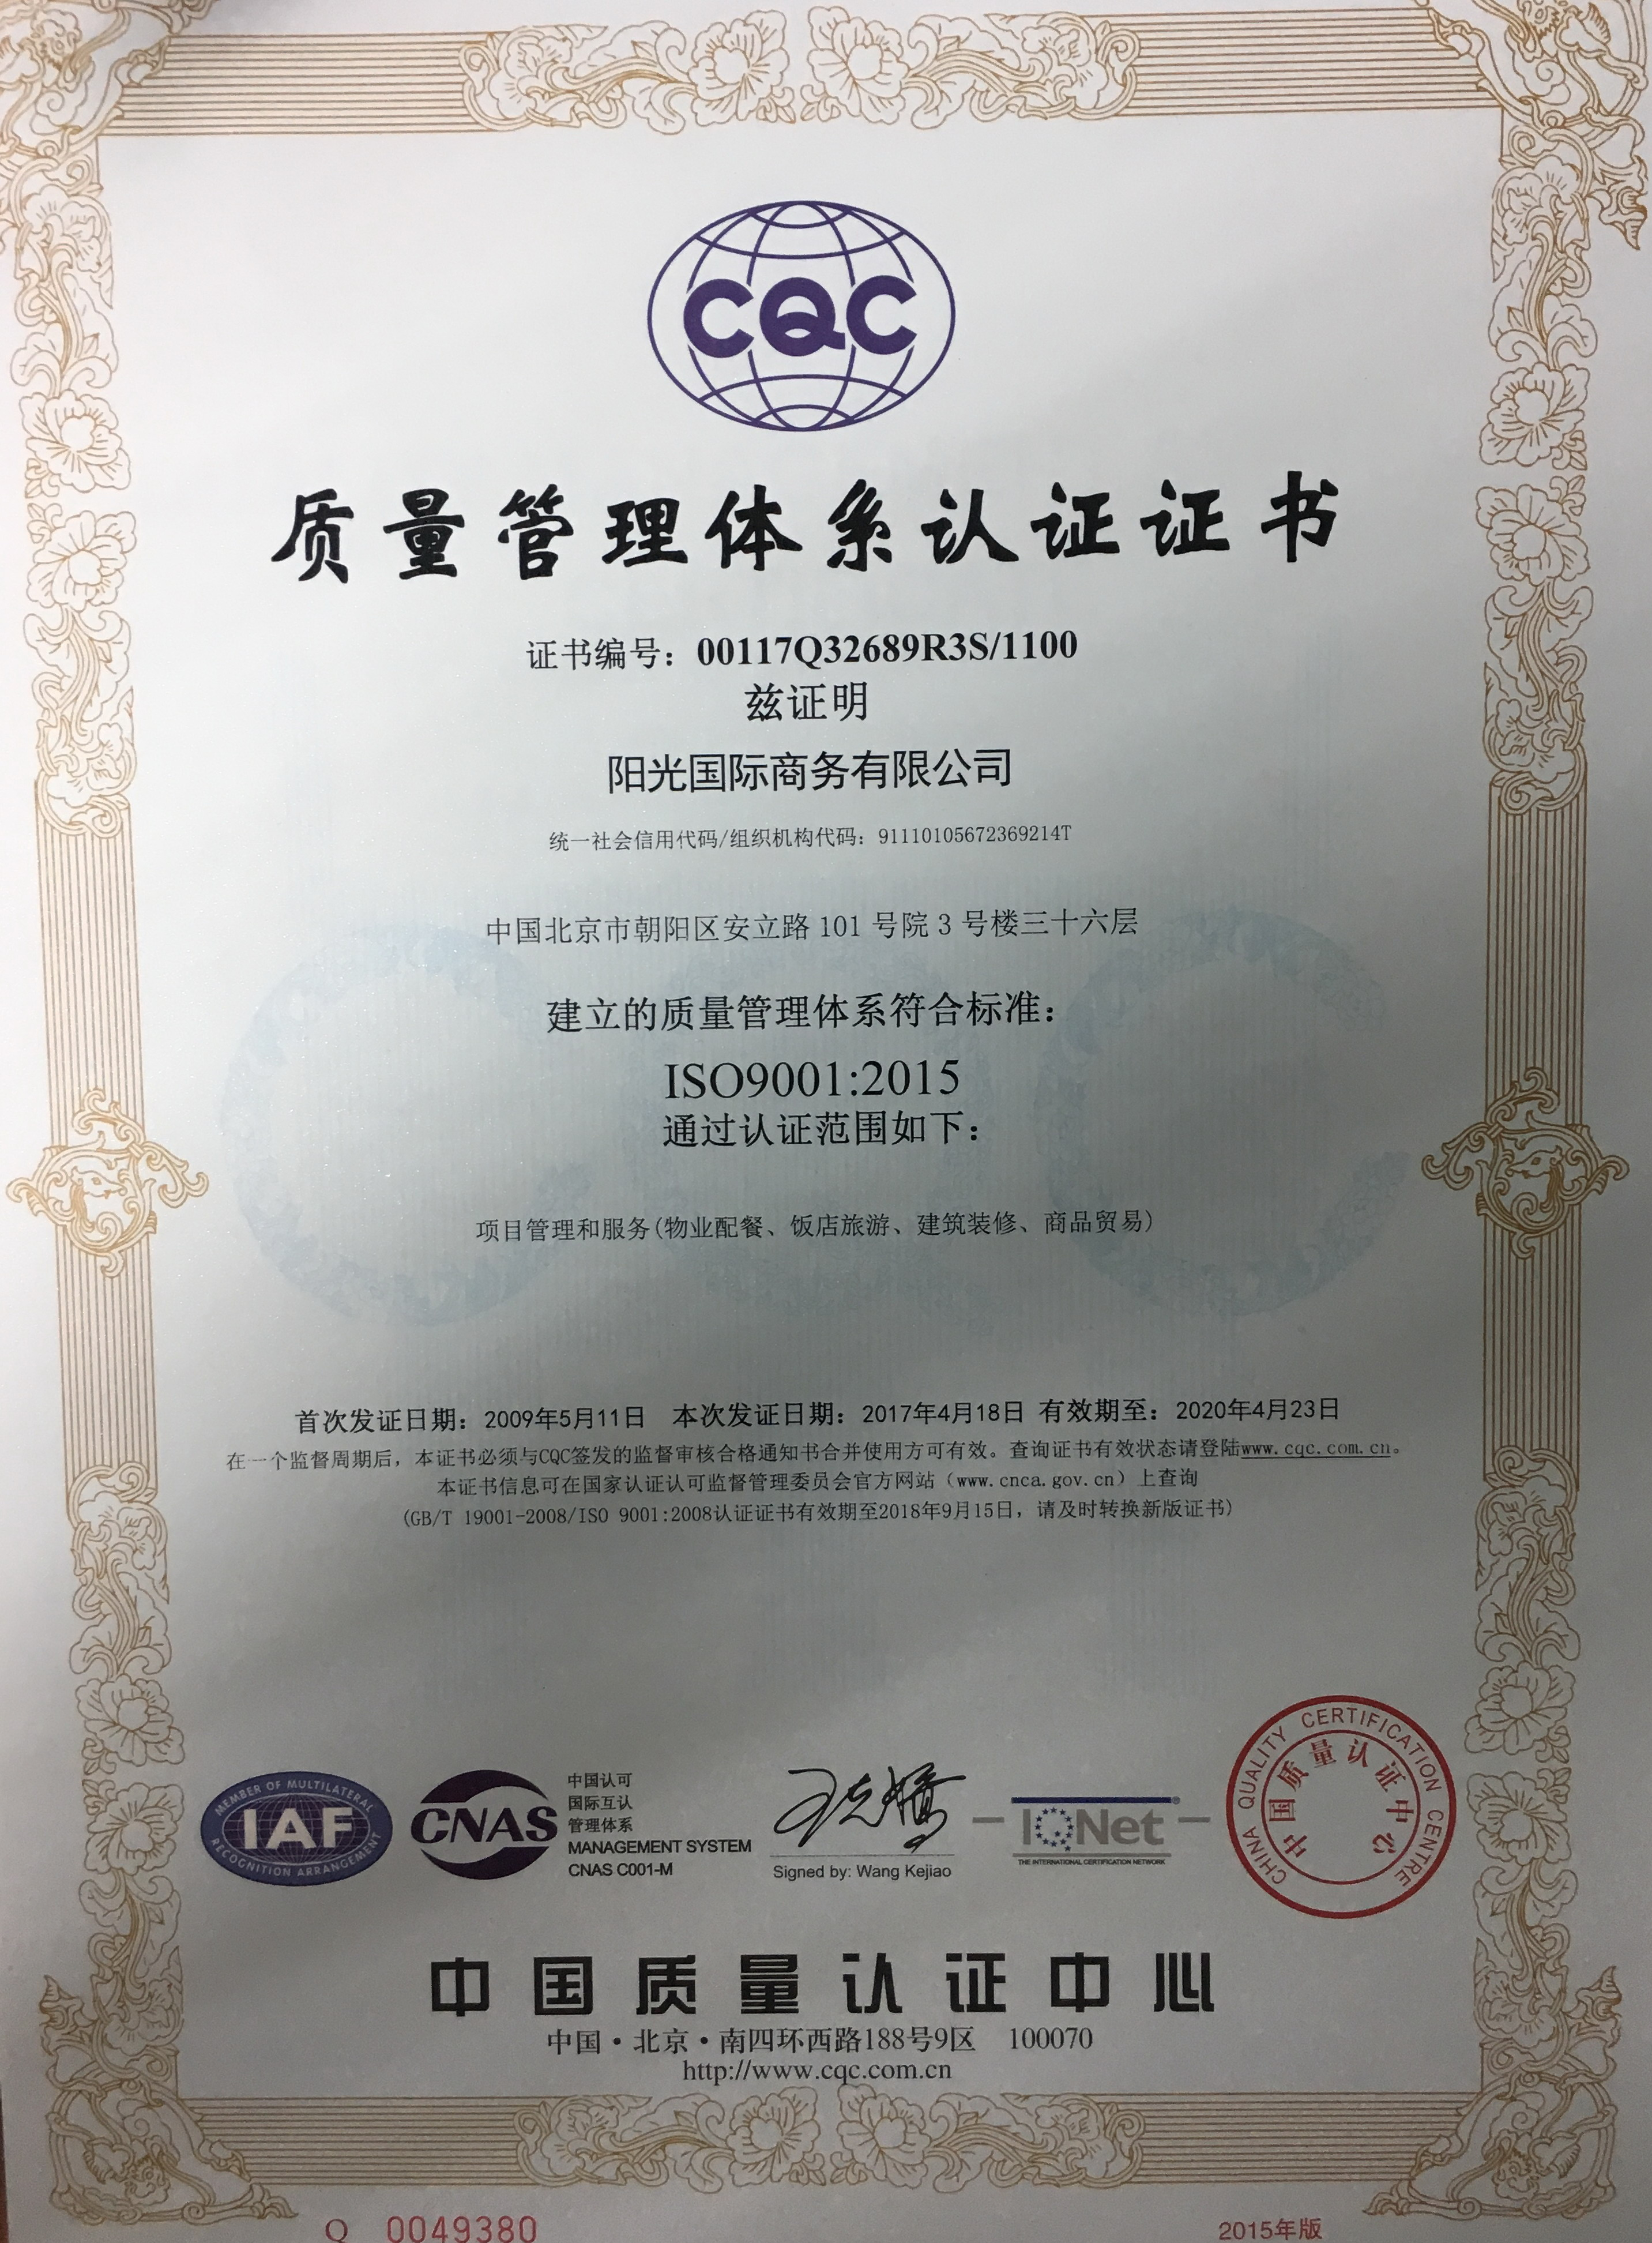 質量認證ISO9001,2015C